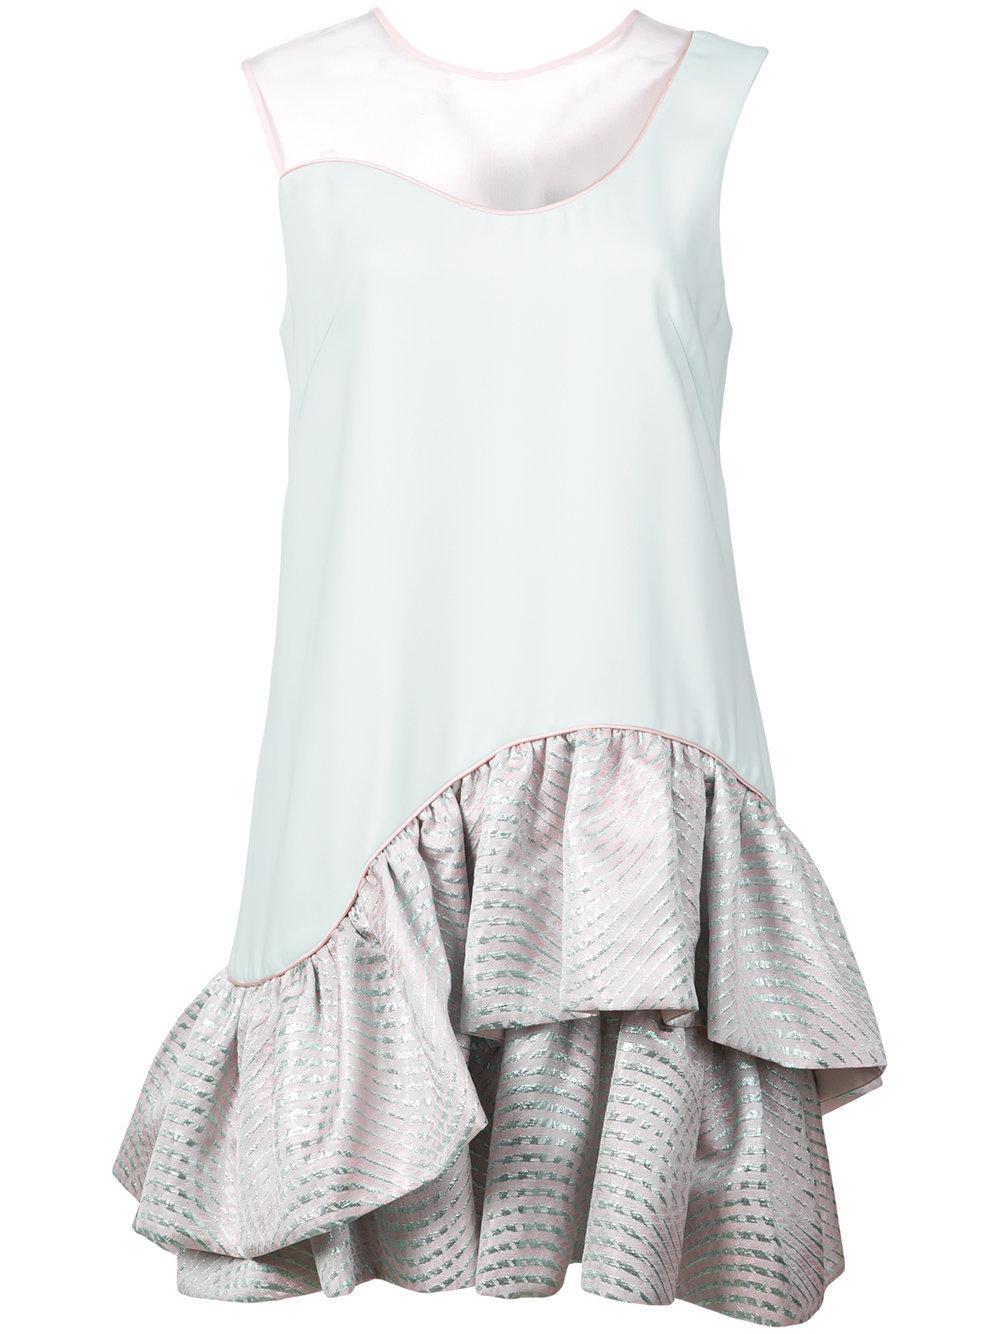 Marin Asymmetrical Hem Dress Item # S18-D453